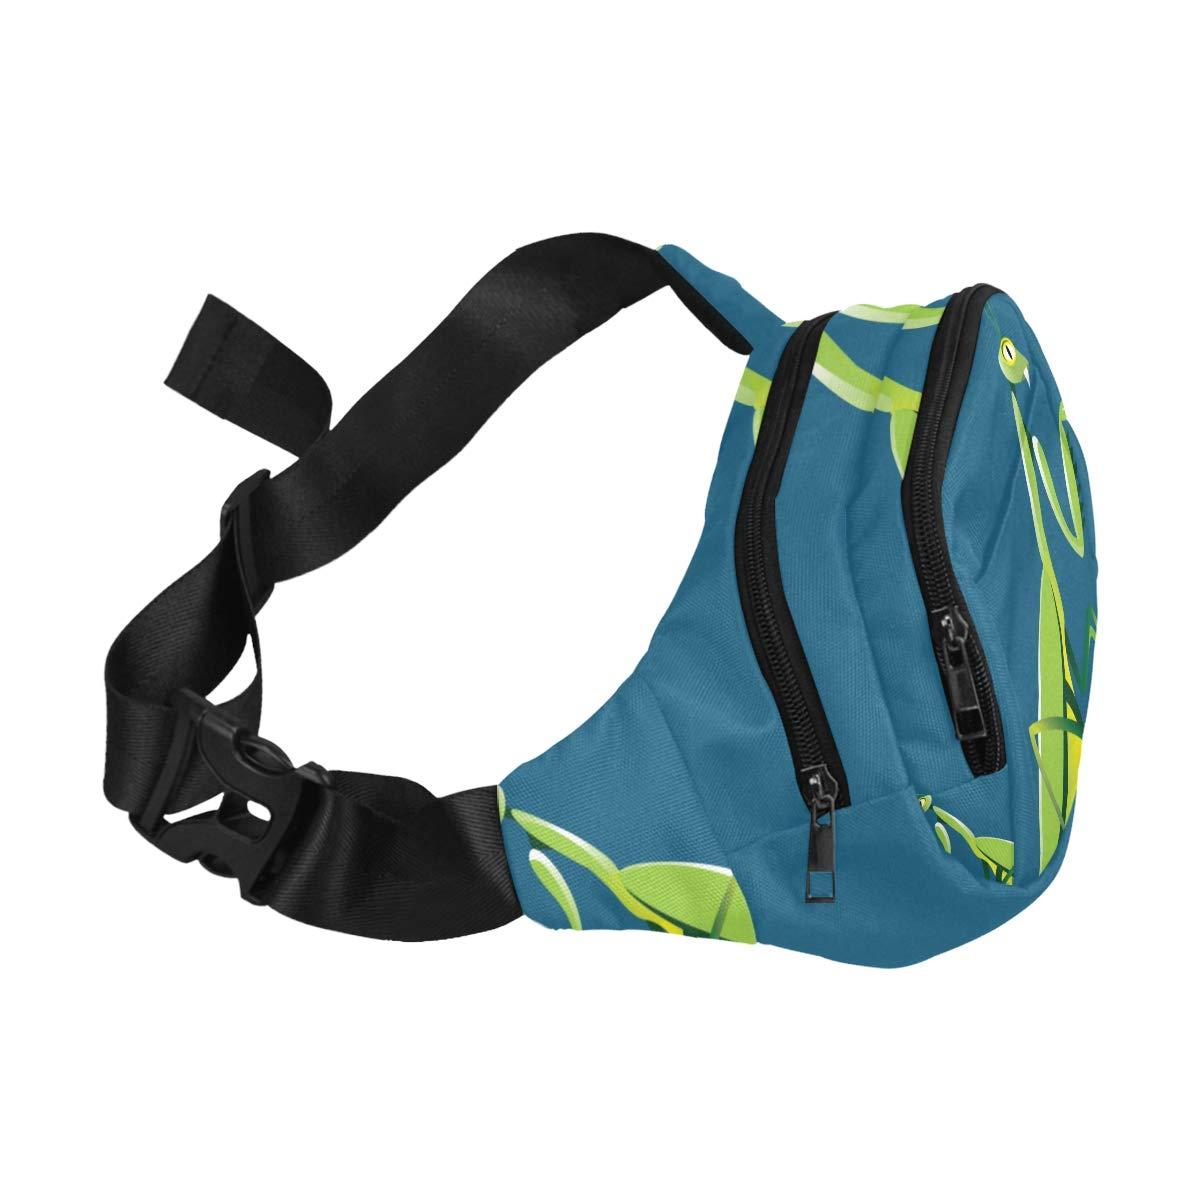 A Wounded Little Mantis Fenny Packs Waist Bags Adjustable Belt Waterproof Nylon Travel Running Sport Vacation Party For Men Women Boys Girls Kids